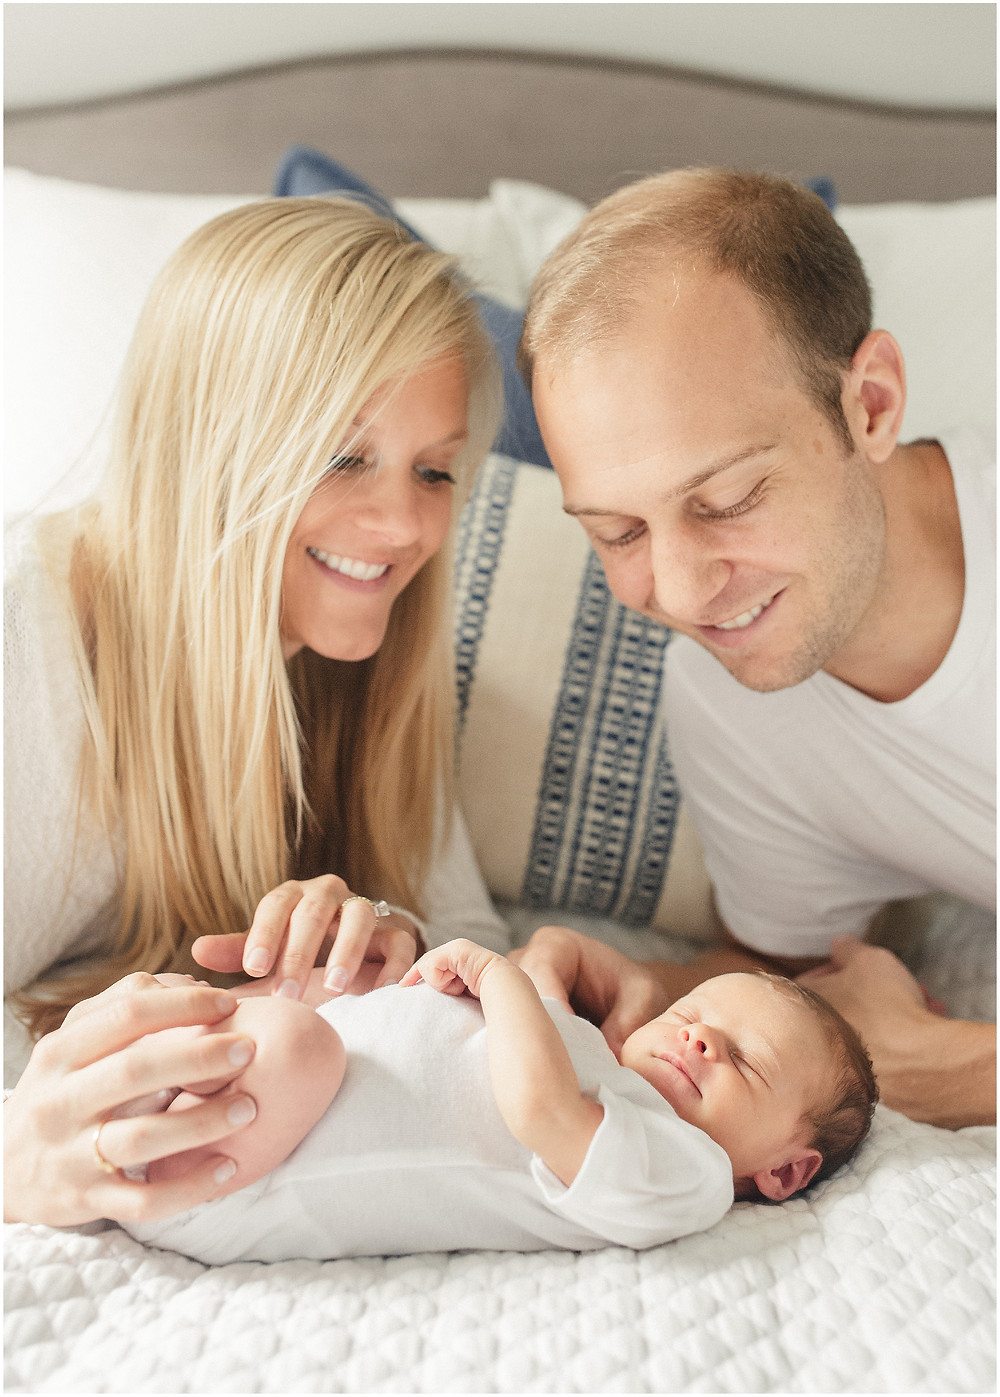 Bay Area newborn session by San Francisco lifestyle fine art photographer Torrey Fox